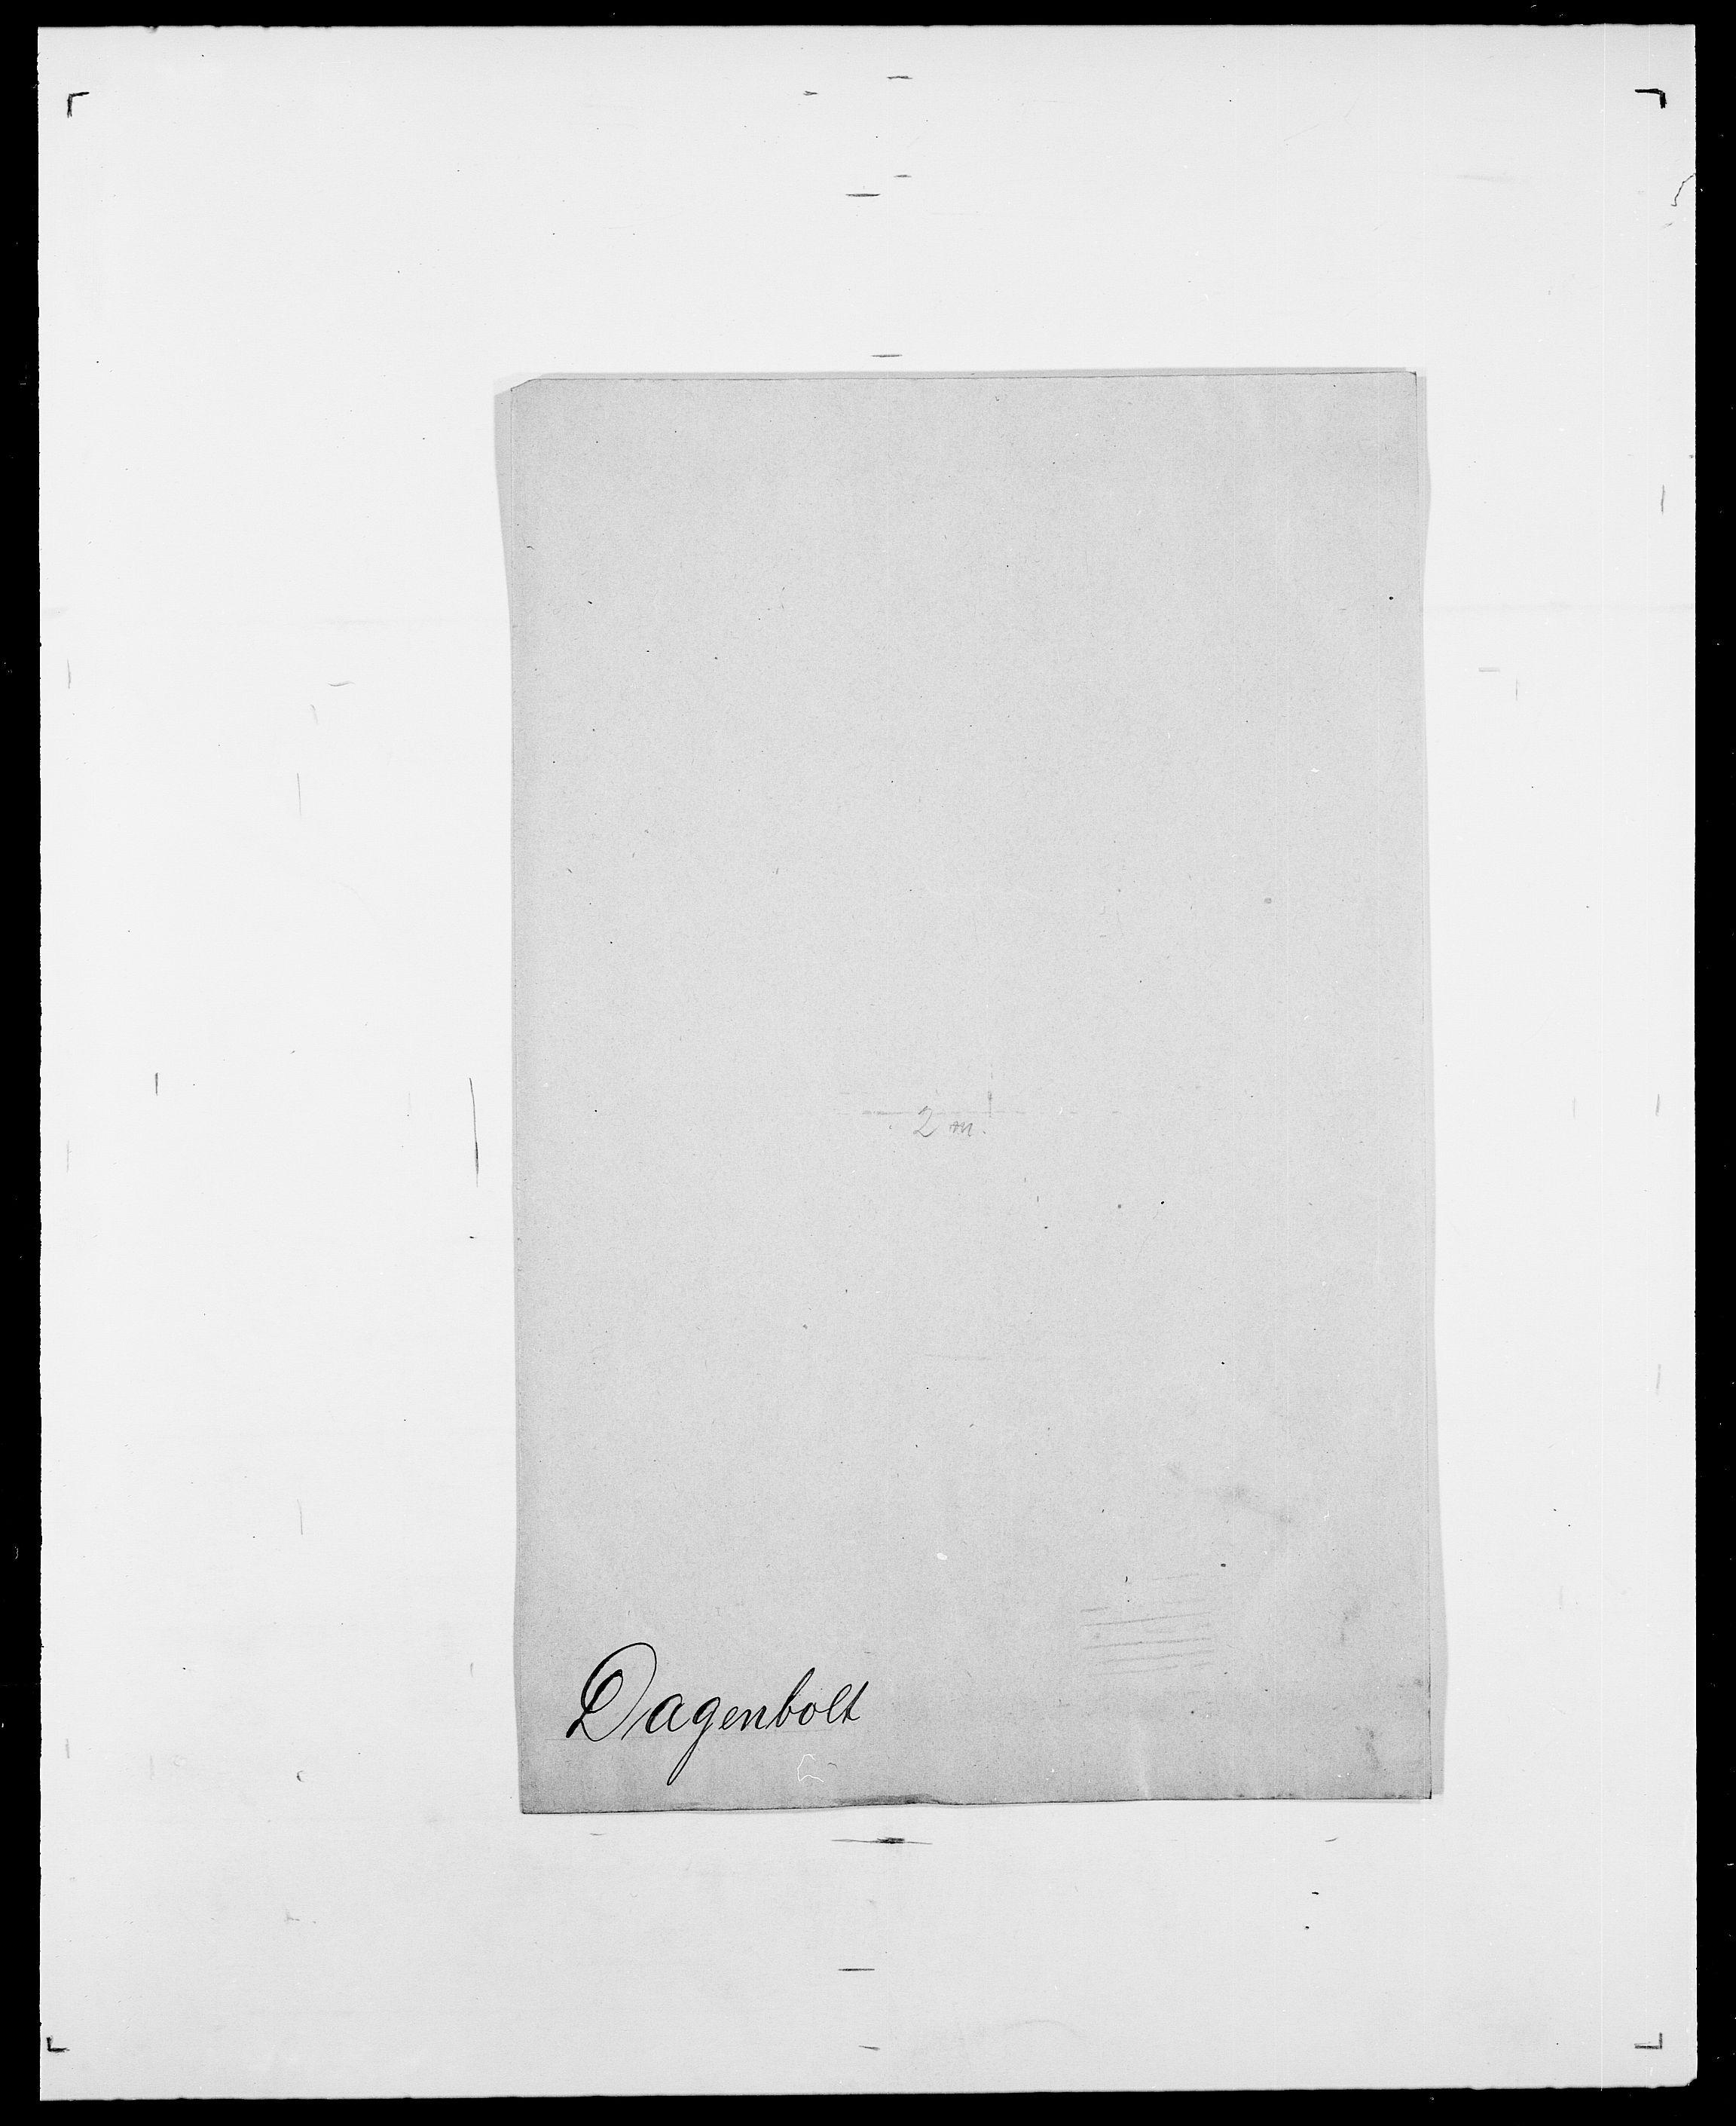 SAO, Delgobe, Charles Antoine - samling, D/Da/L0008: Capjon - Dagenbolt, s. 700